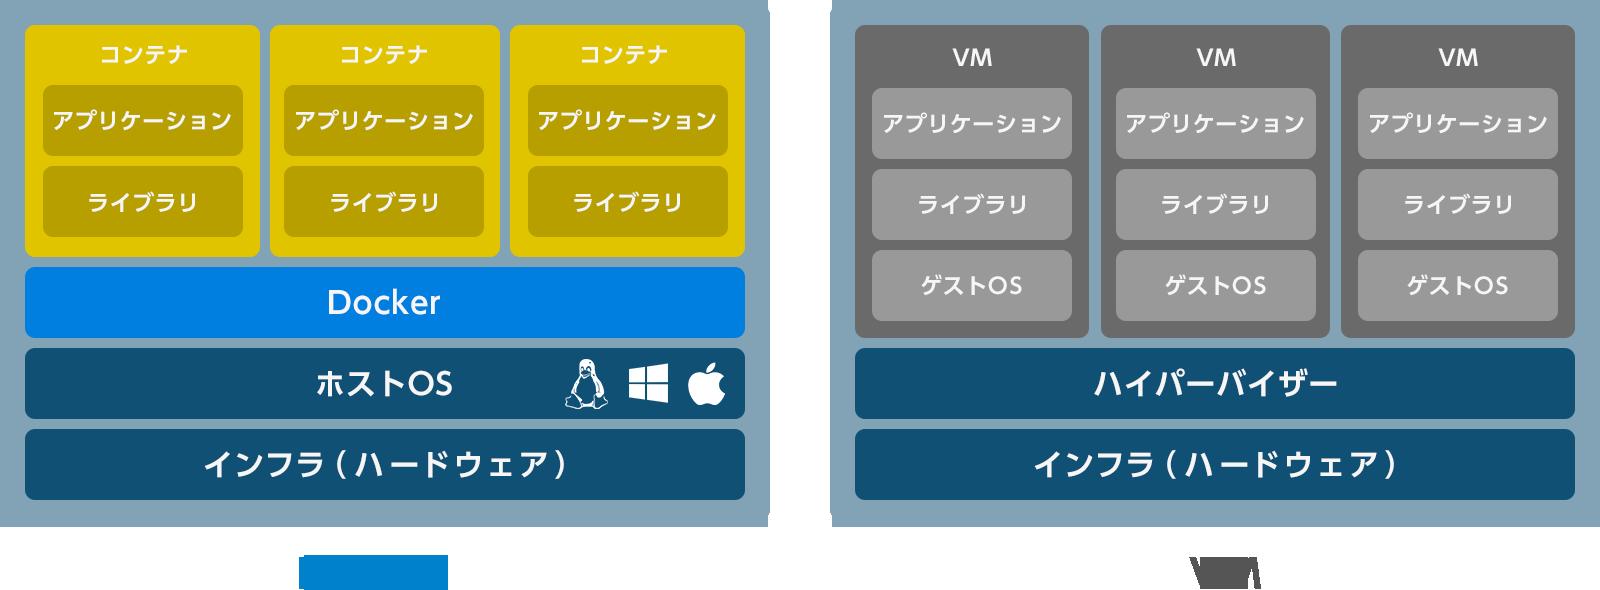 DockerとVMの構造比較